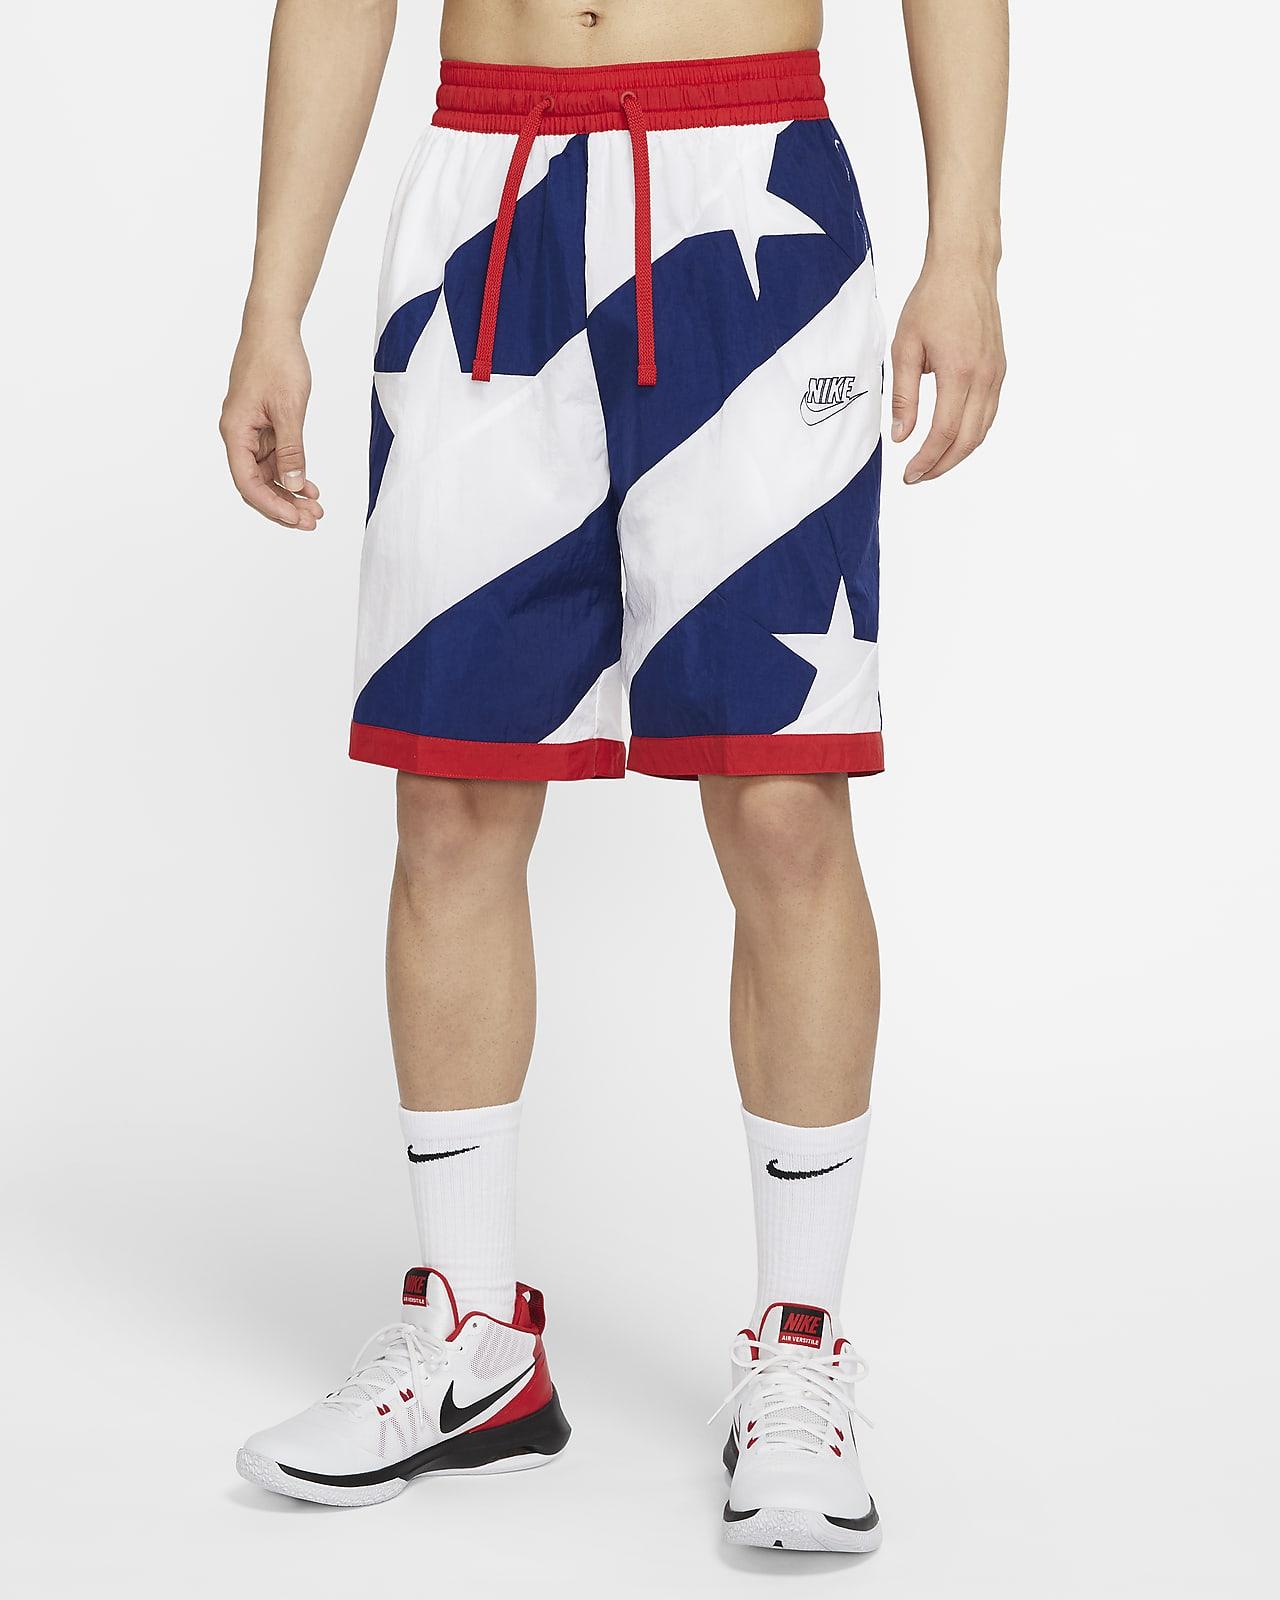 Nike Dri-FIT Throwback Men's Basketball Shorts